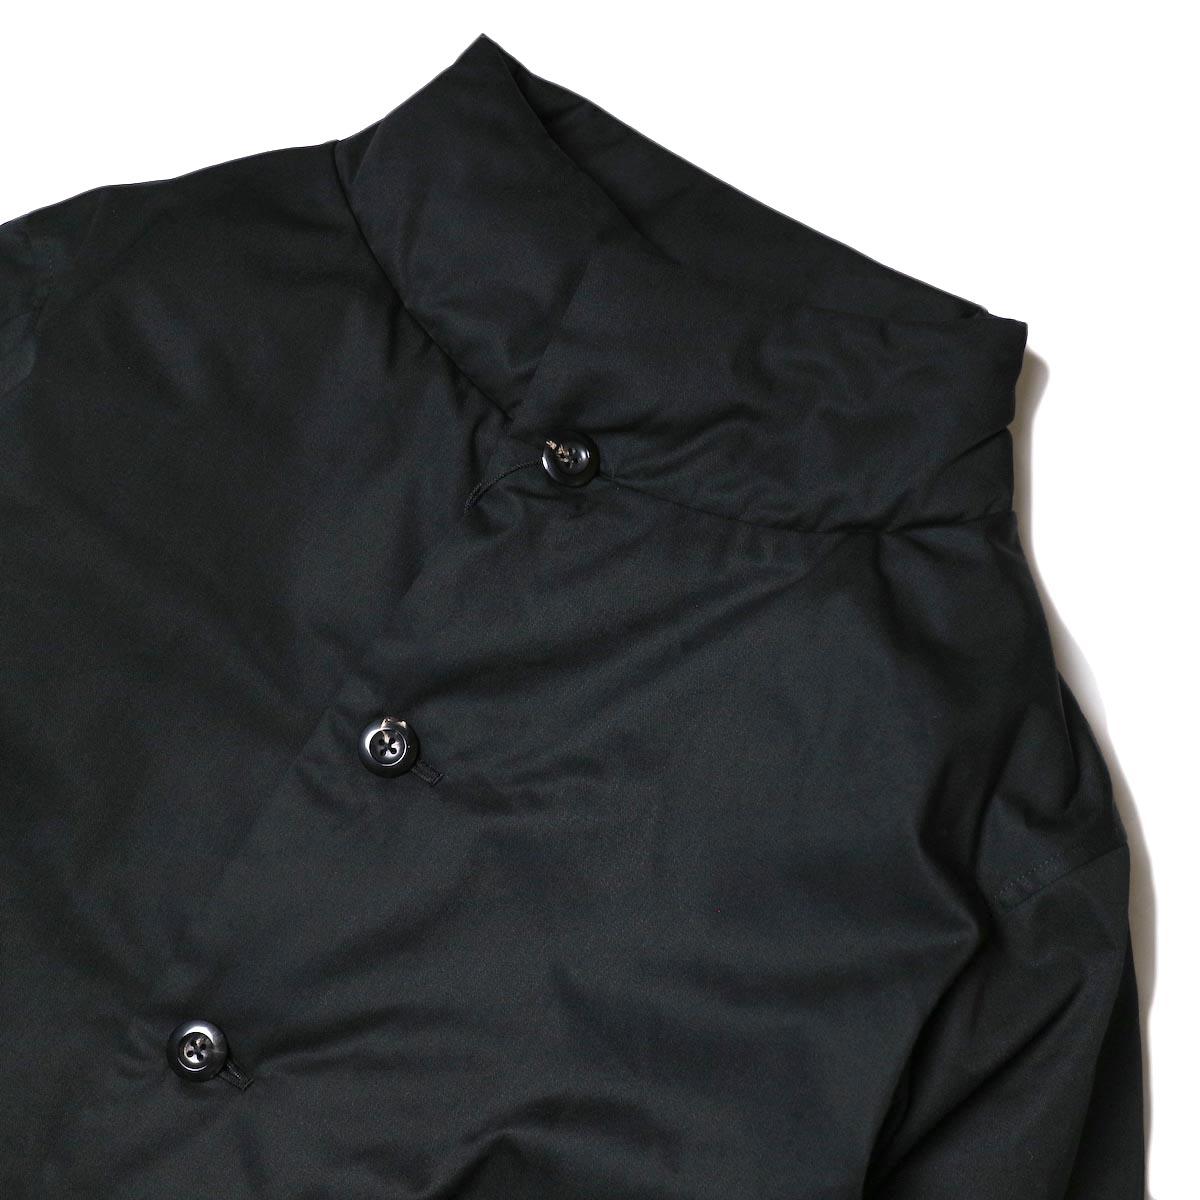 THE LOFT LABO / NARDY (Black) スタンドカラー・ボタン